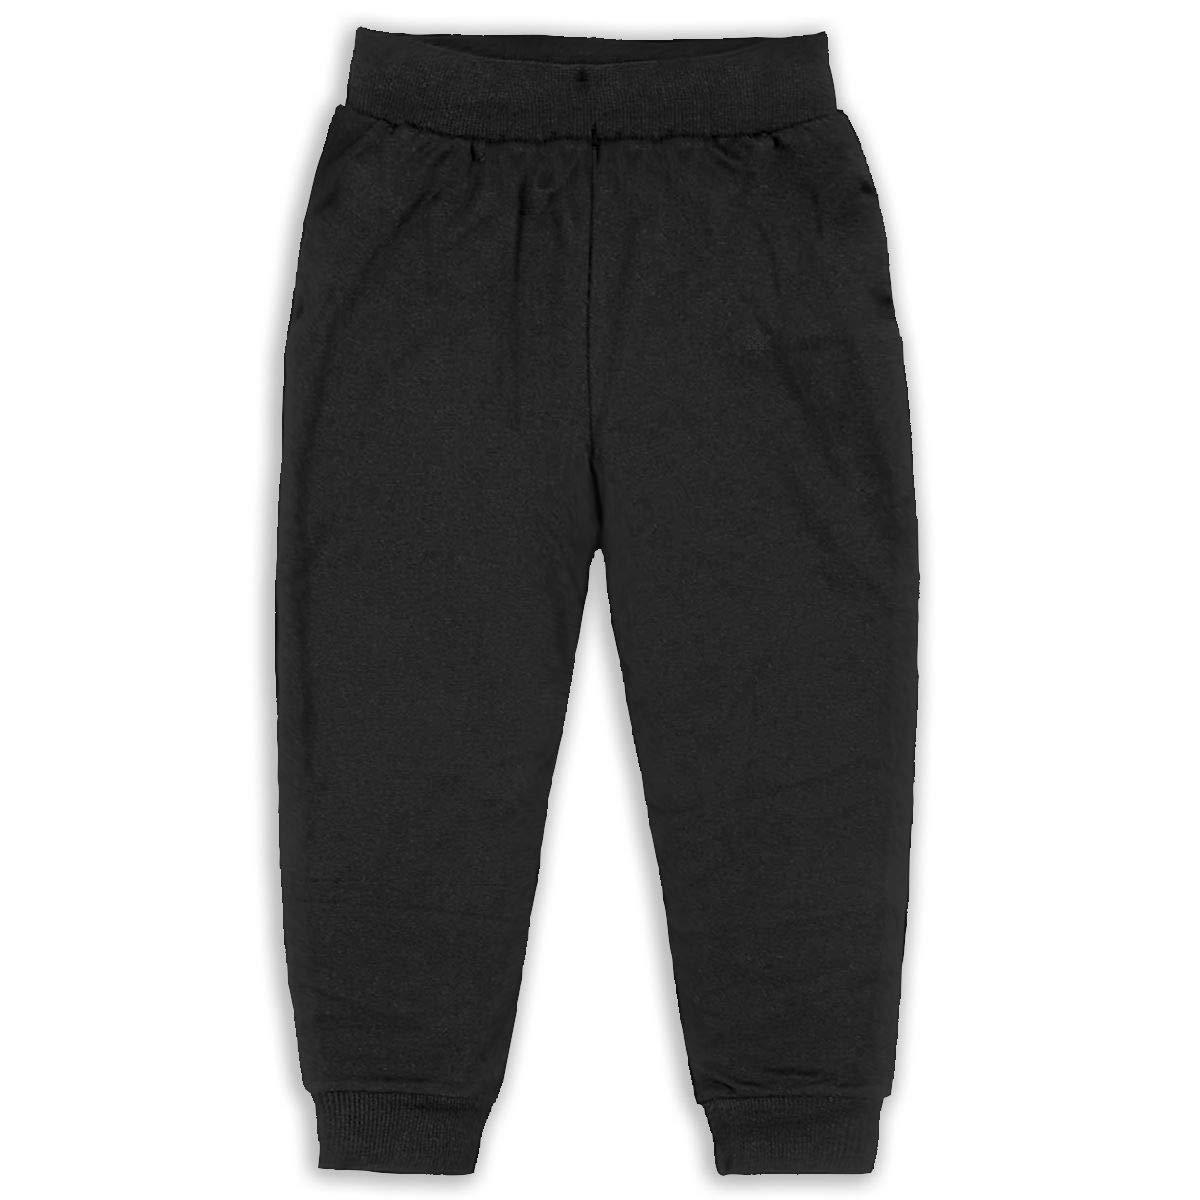 Fleece Active Joggers Elastic Pants United States Coast Guard 1790 Sweatpants for Boys /& Girls